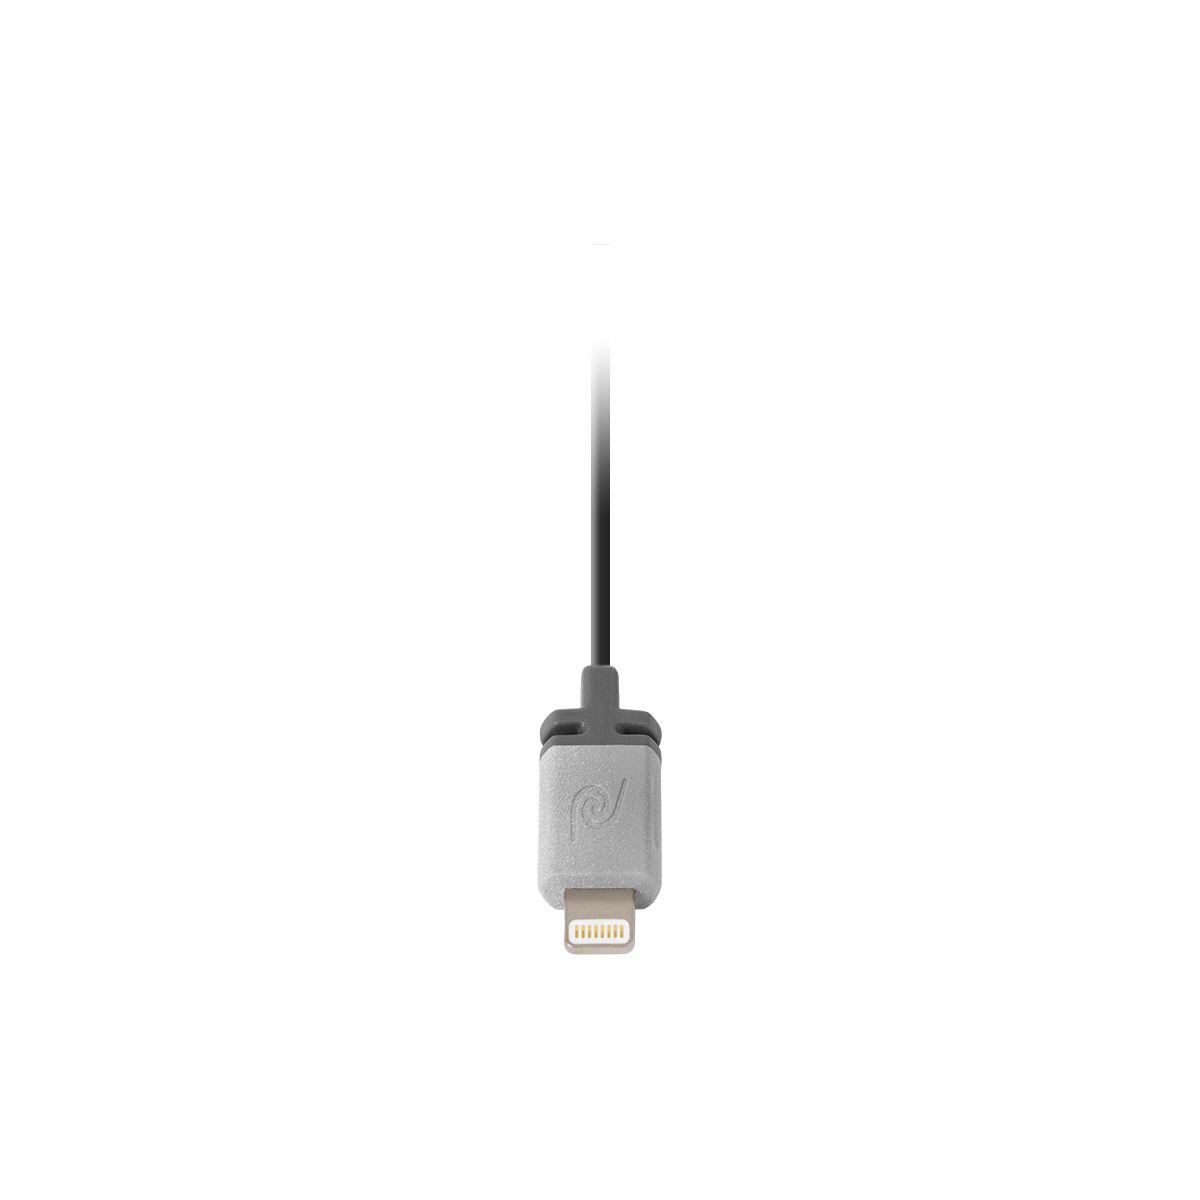 Câble lightning retrak silver - 15% de remise immédiate avec le code : multi15 (photo)